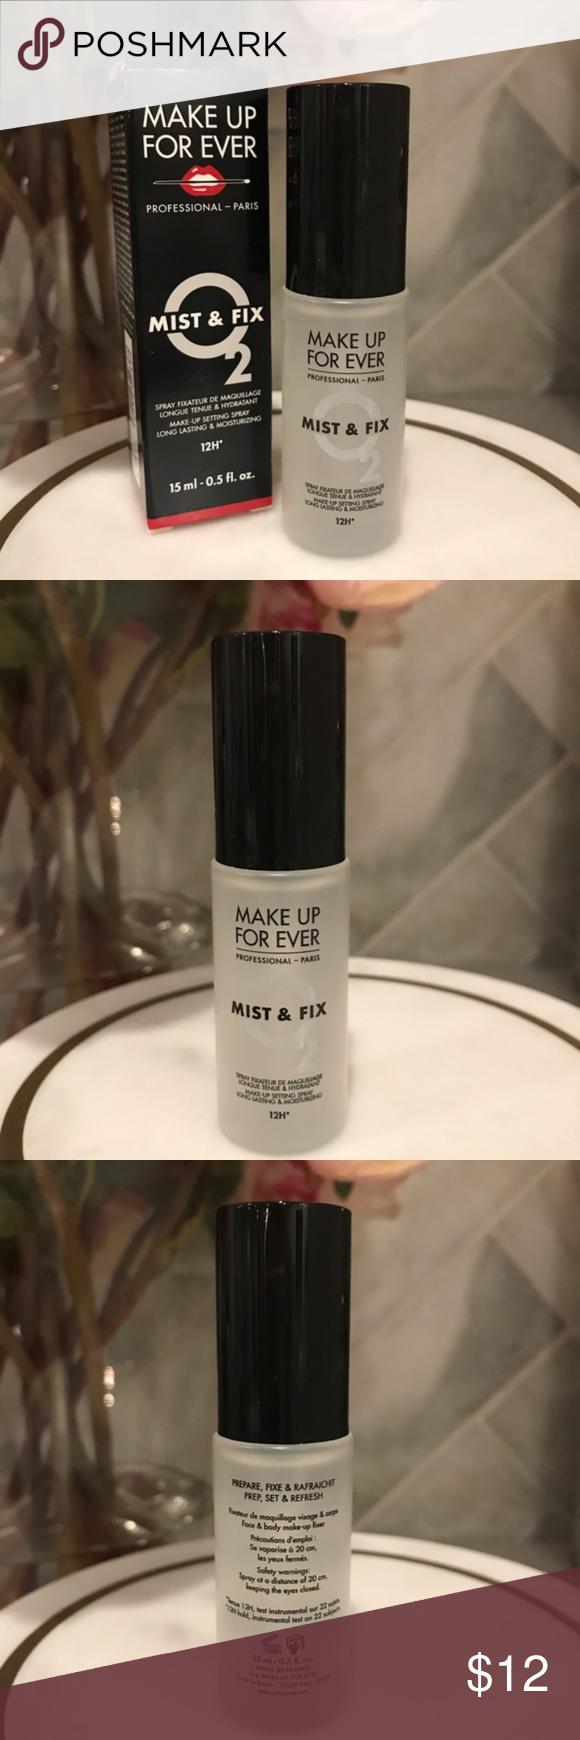 5 for 30, MakeUp ForEver Mist & Fix Setting Spray